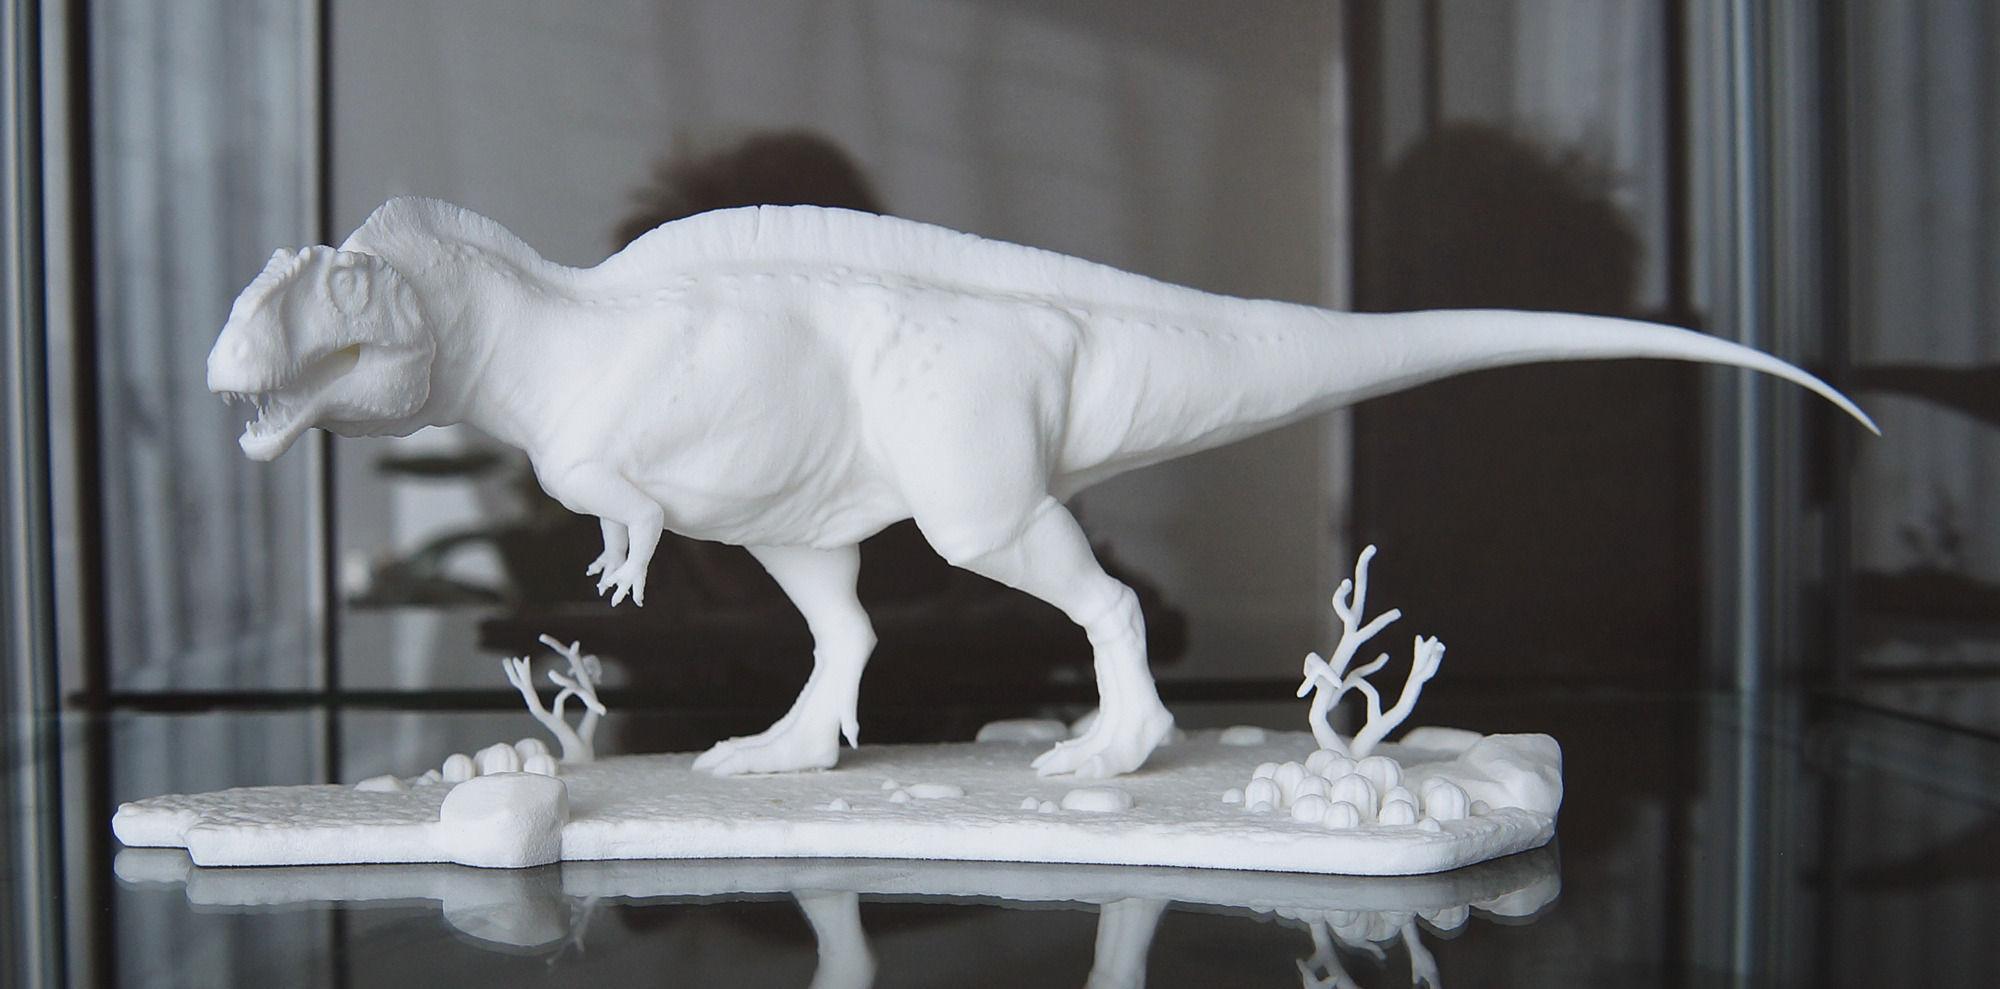 Acrocanthosaurus with Desert Pedestal HIGH QUALITY